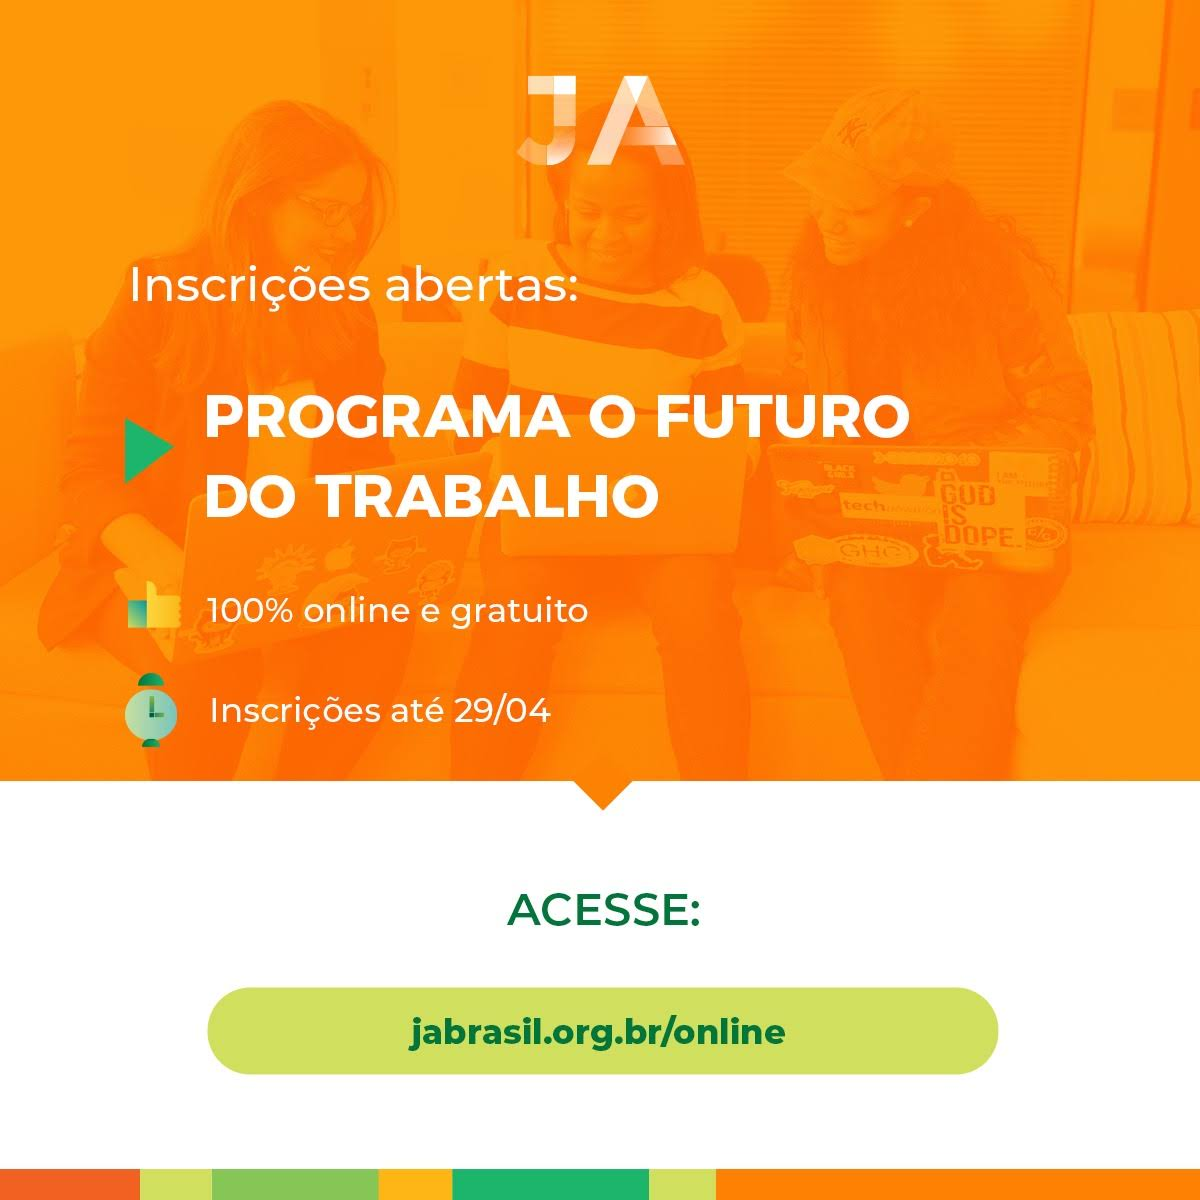 Programa O Futuro do Trabalho